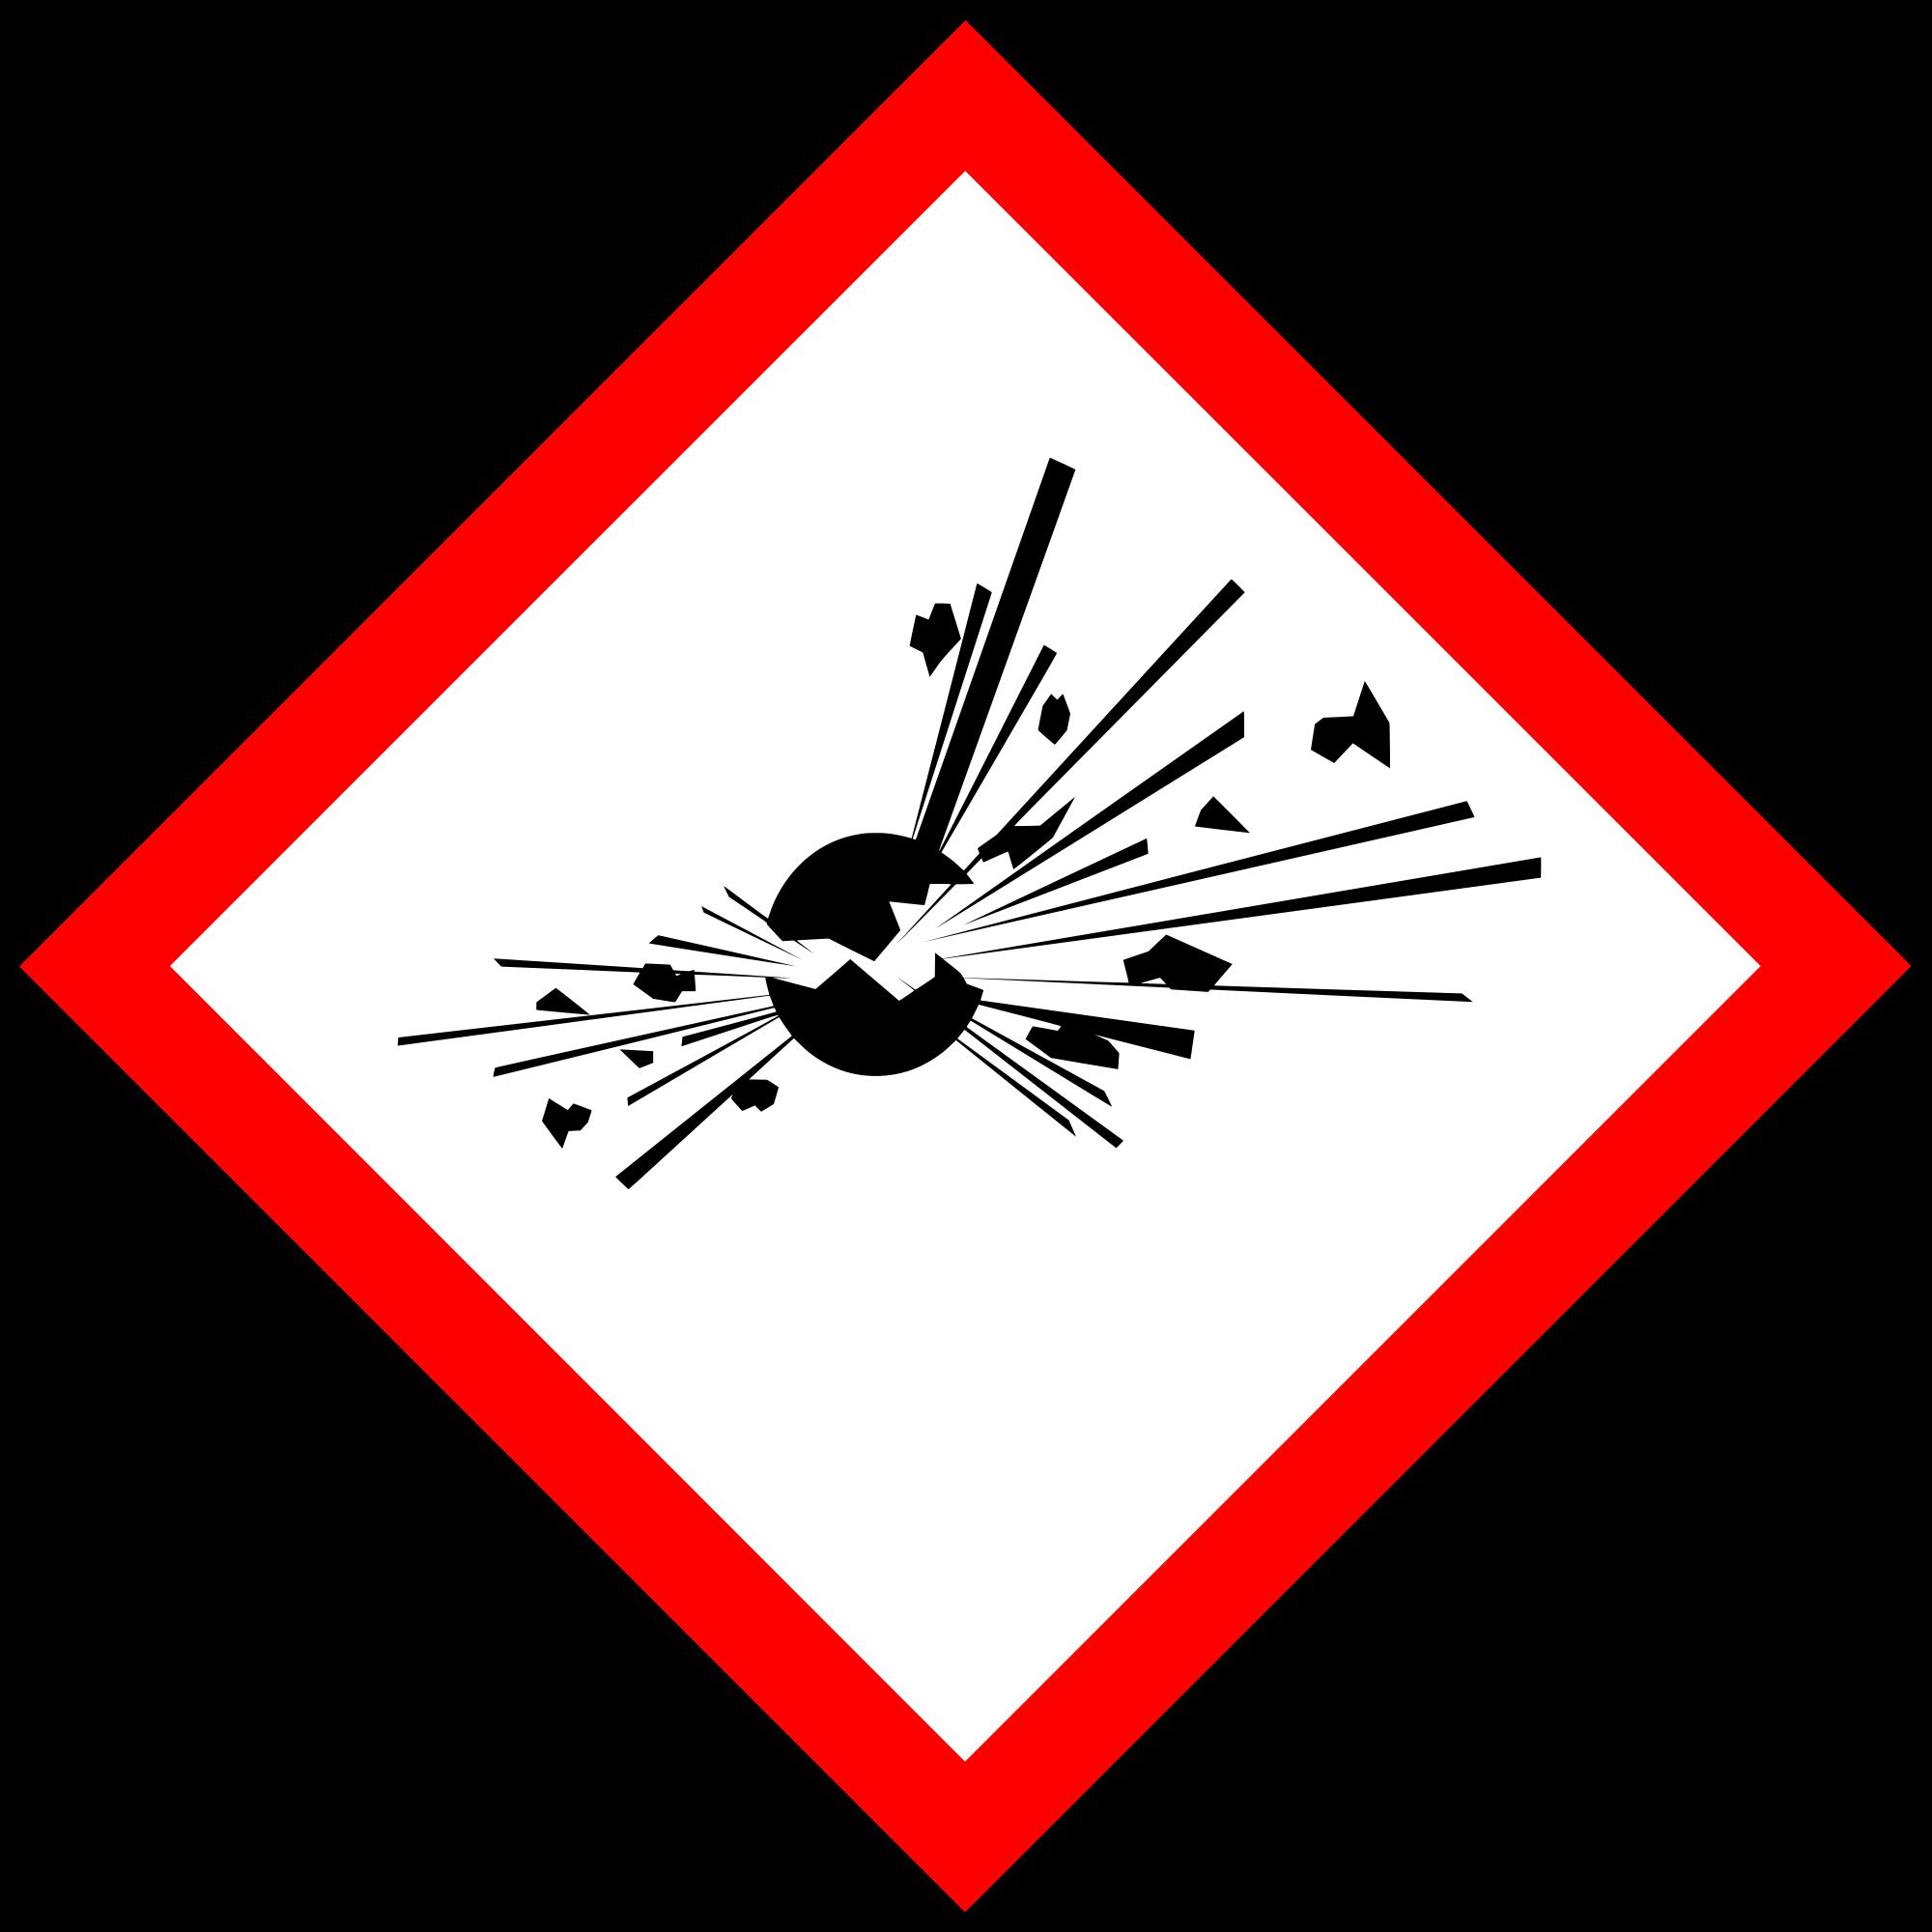 explosiv